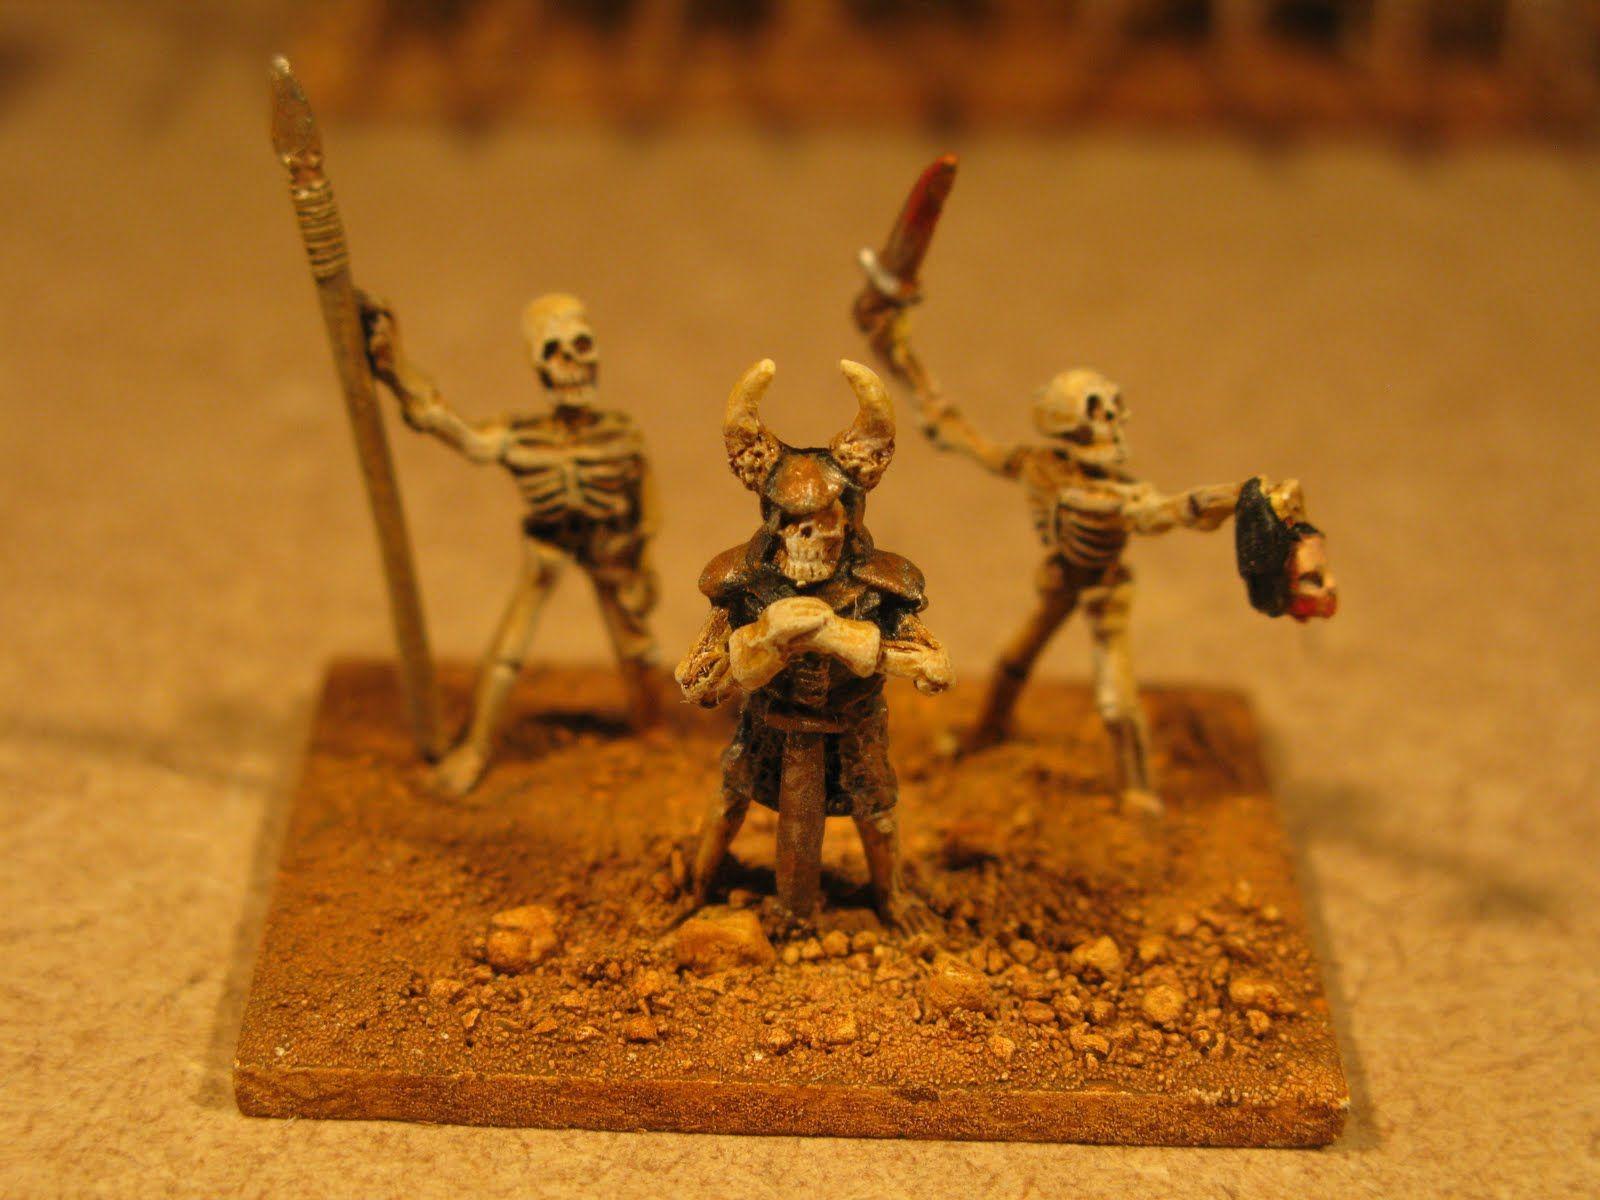 Jim's Wargames Workbench: HOTT 15mm Skeleton Army | hunter's 6th